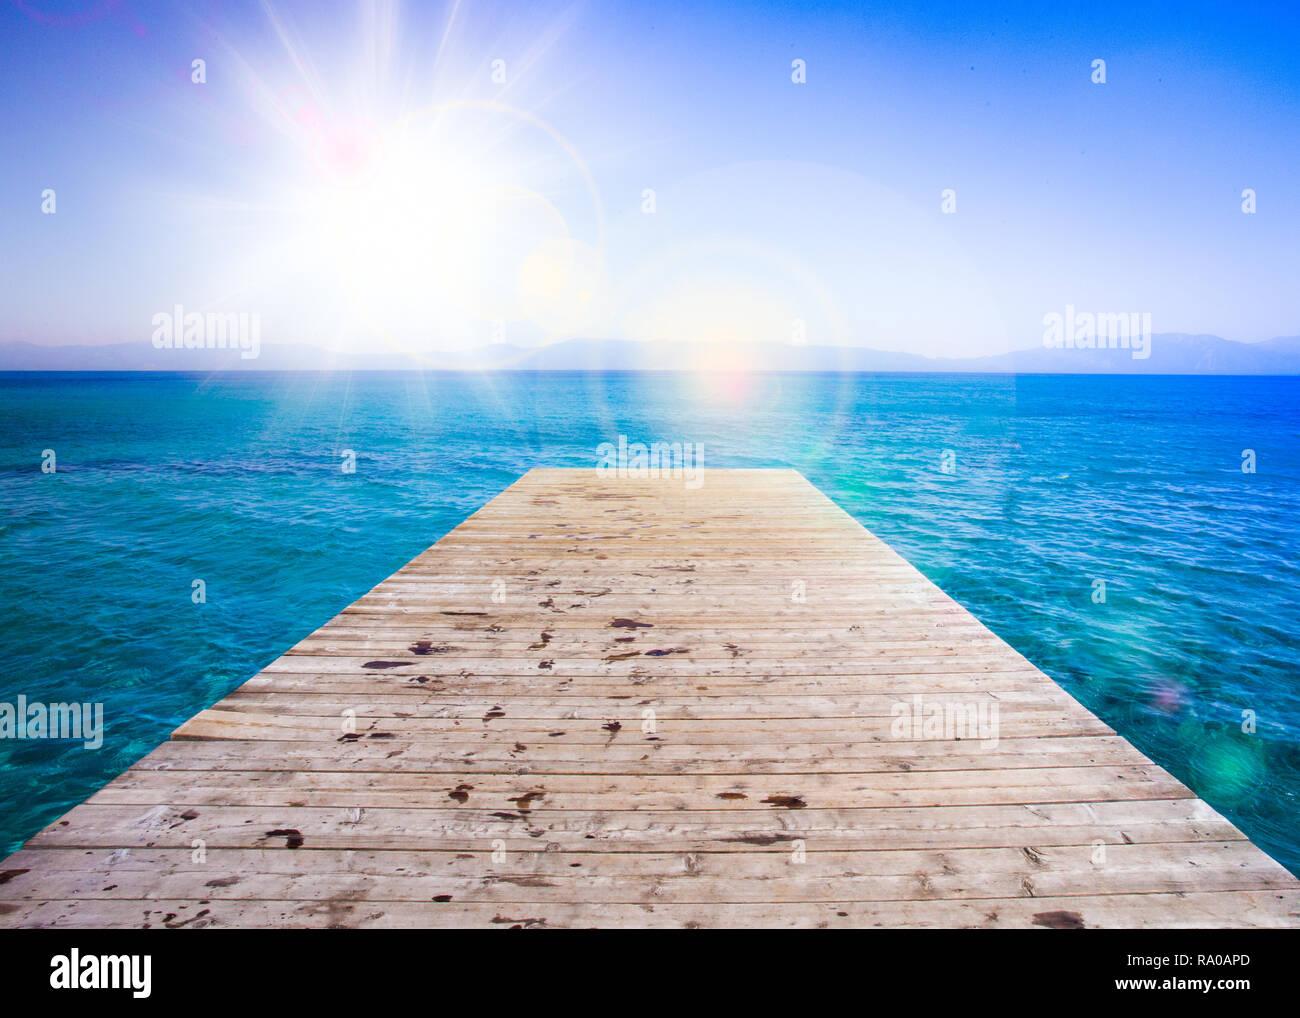 Idyllic water scene with wooden dock and Lake Tahoe - Stock Image